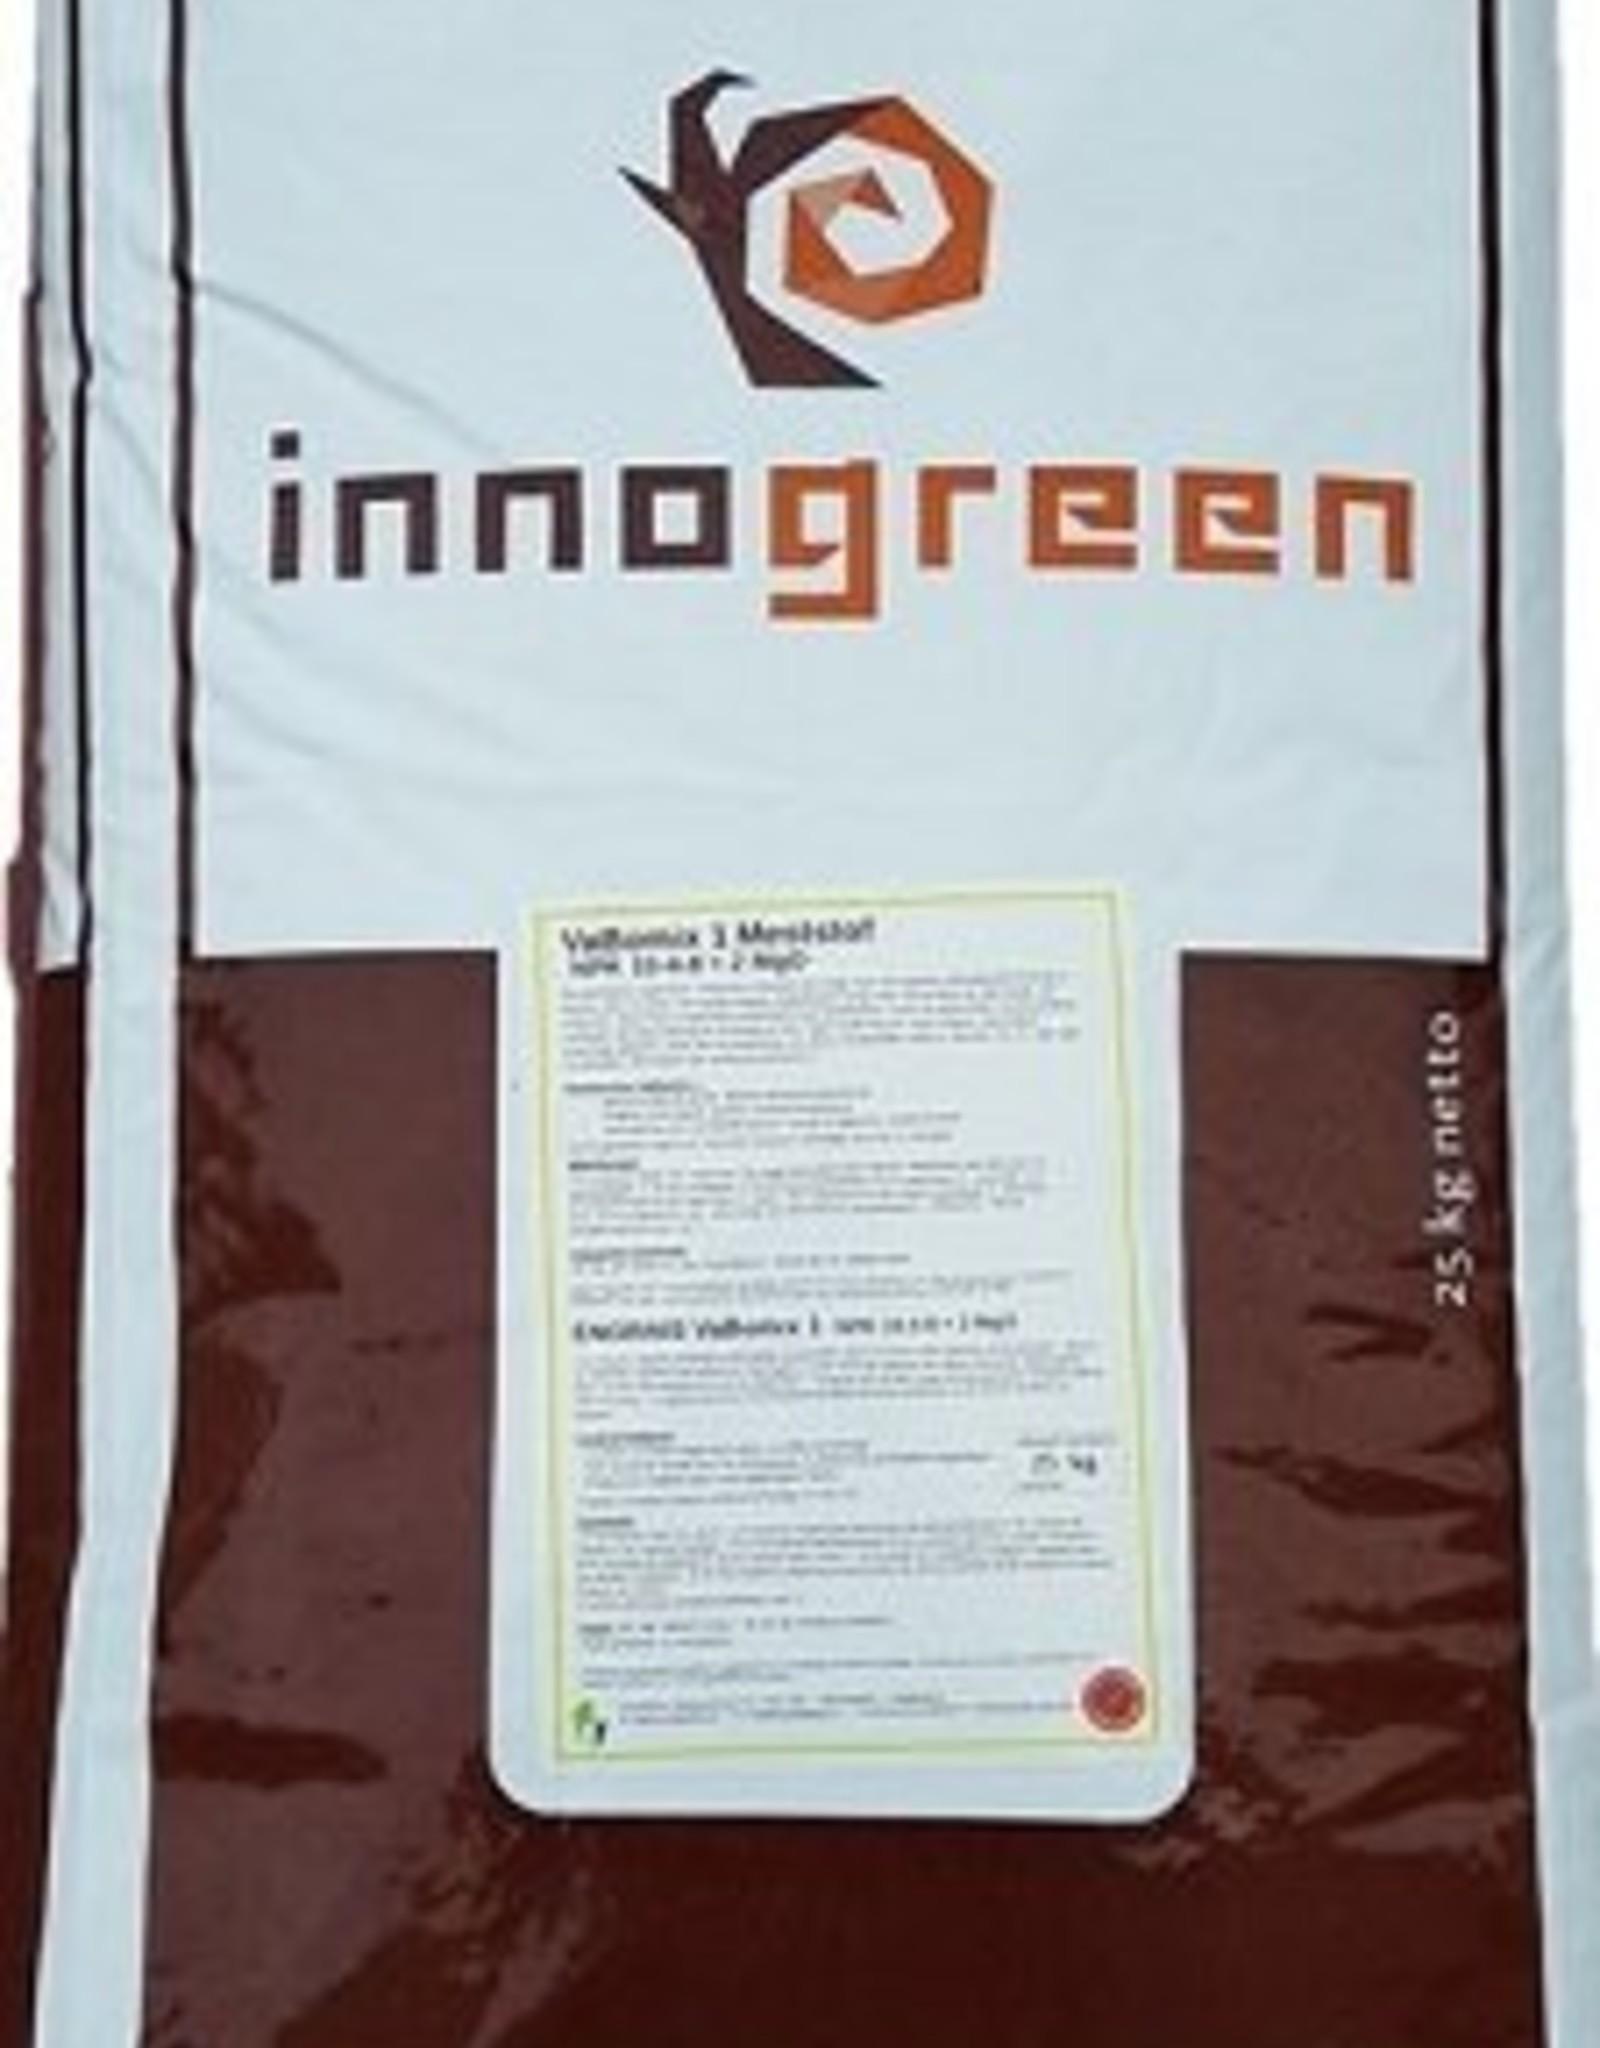 Brimex Innogreen Innogreen Vabomix1 10-4-8 + 2 Mgo